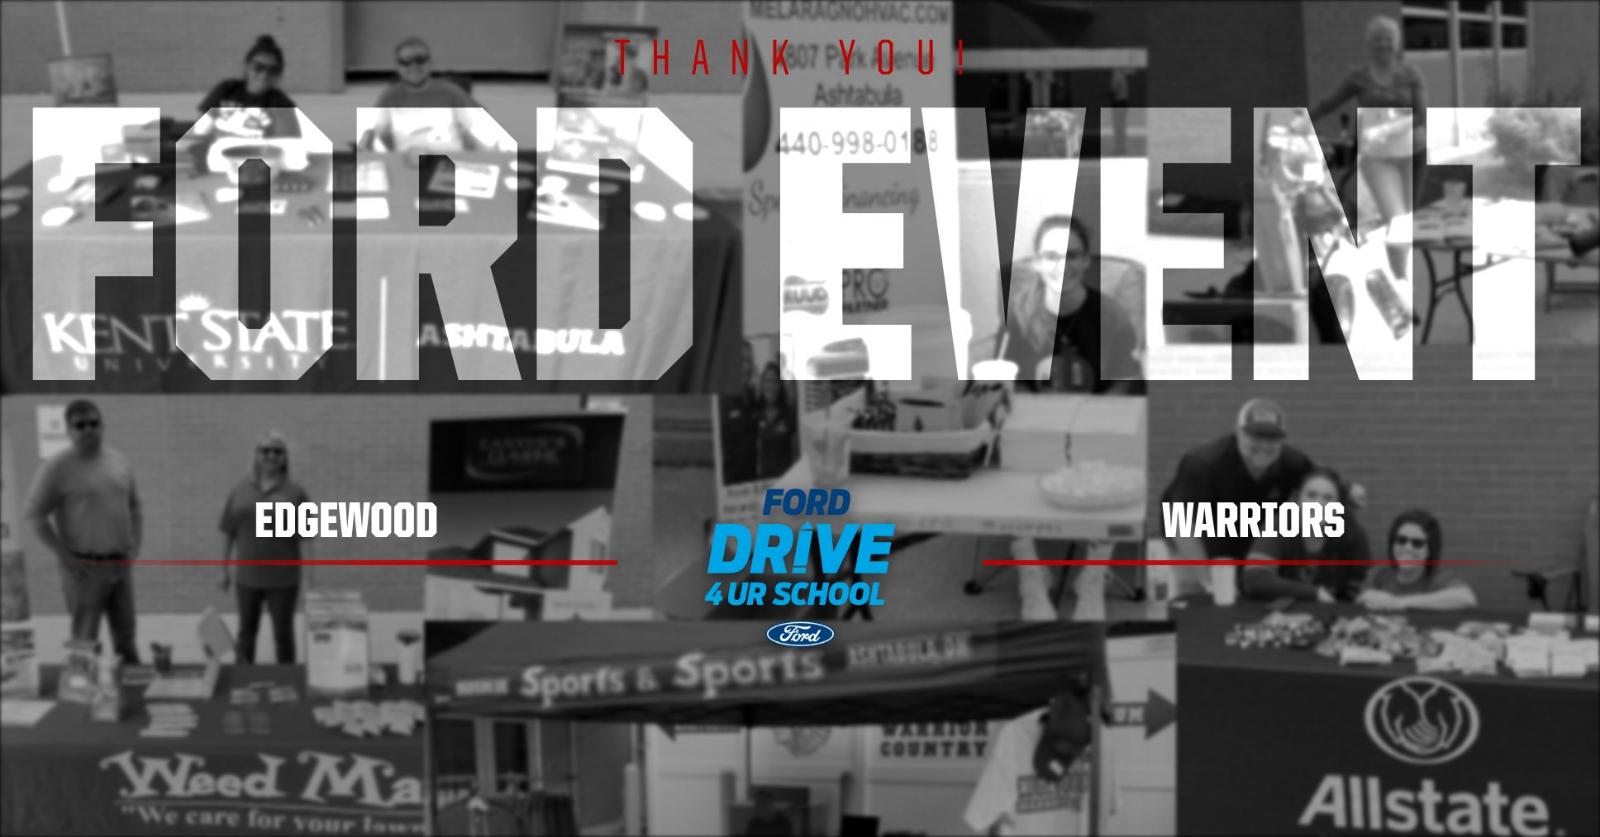 Ford Drive 4UR School Event a Success!